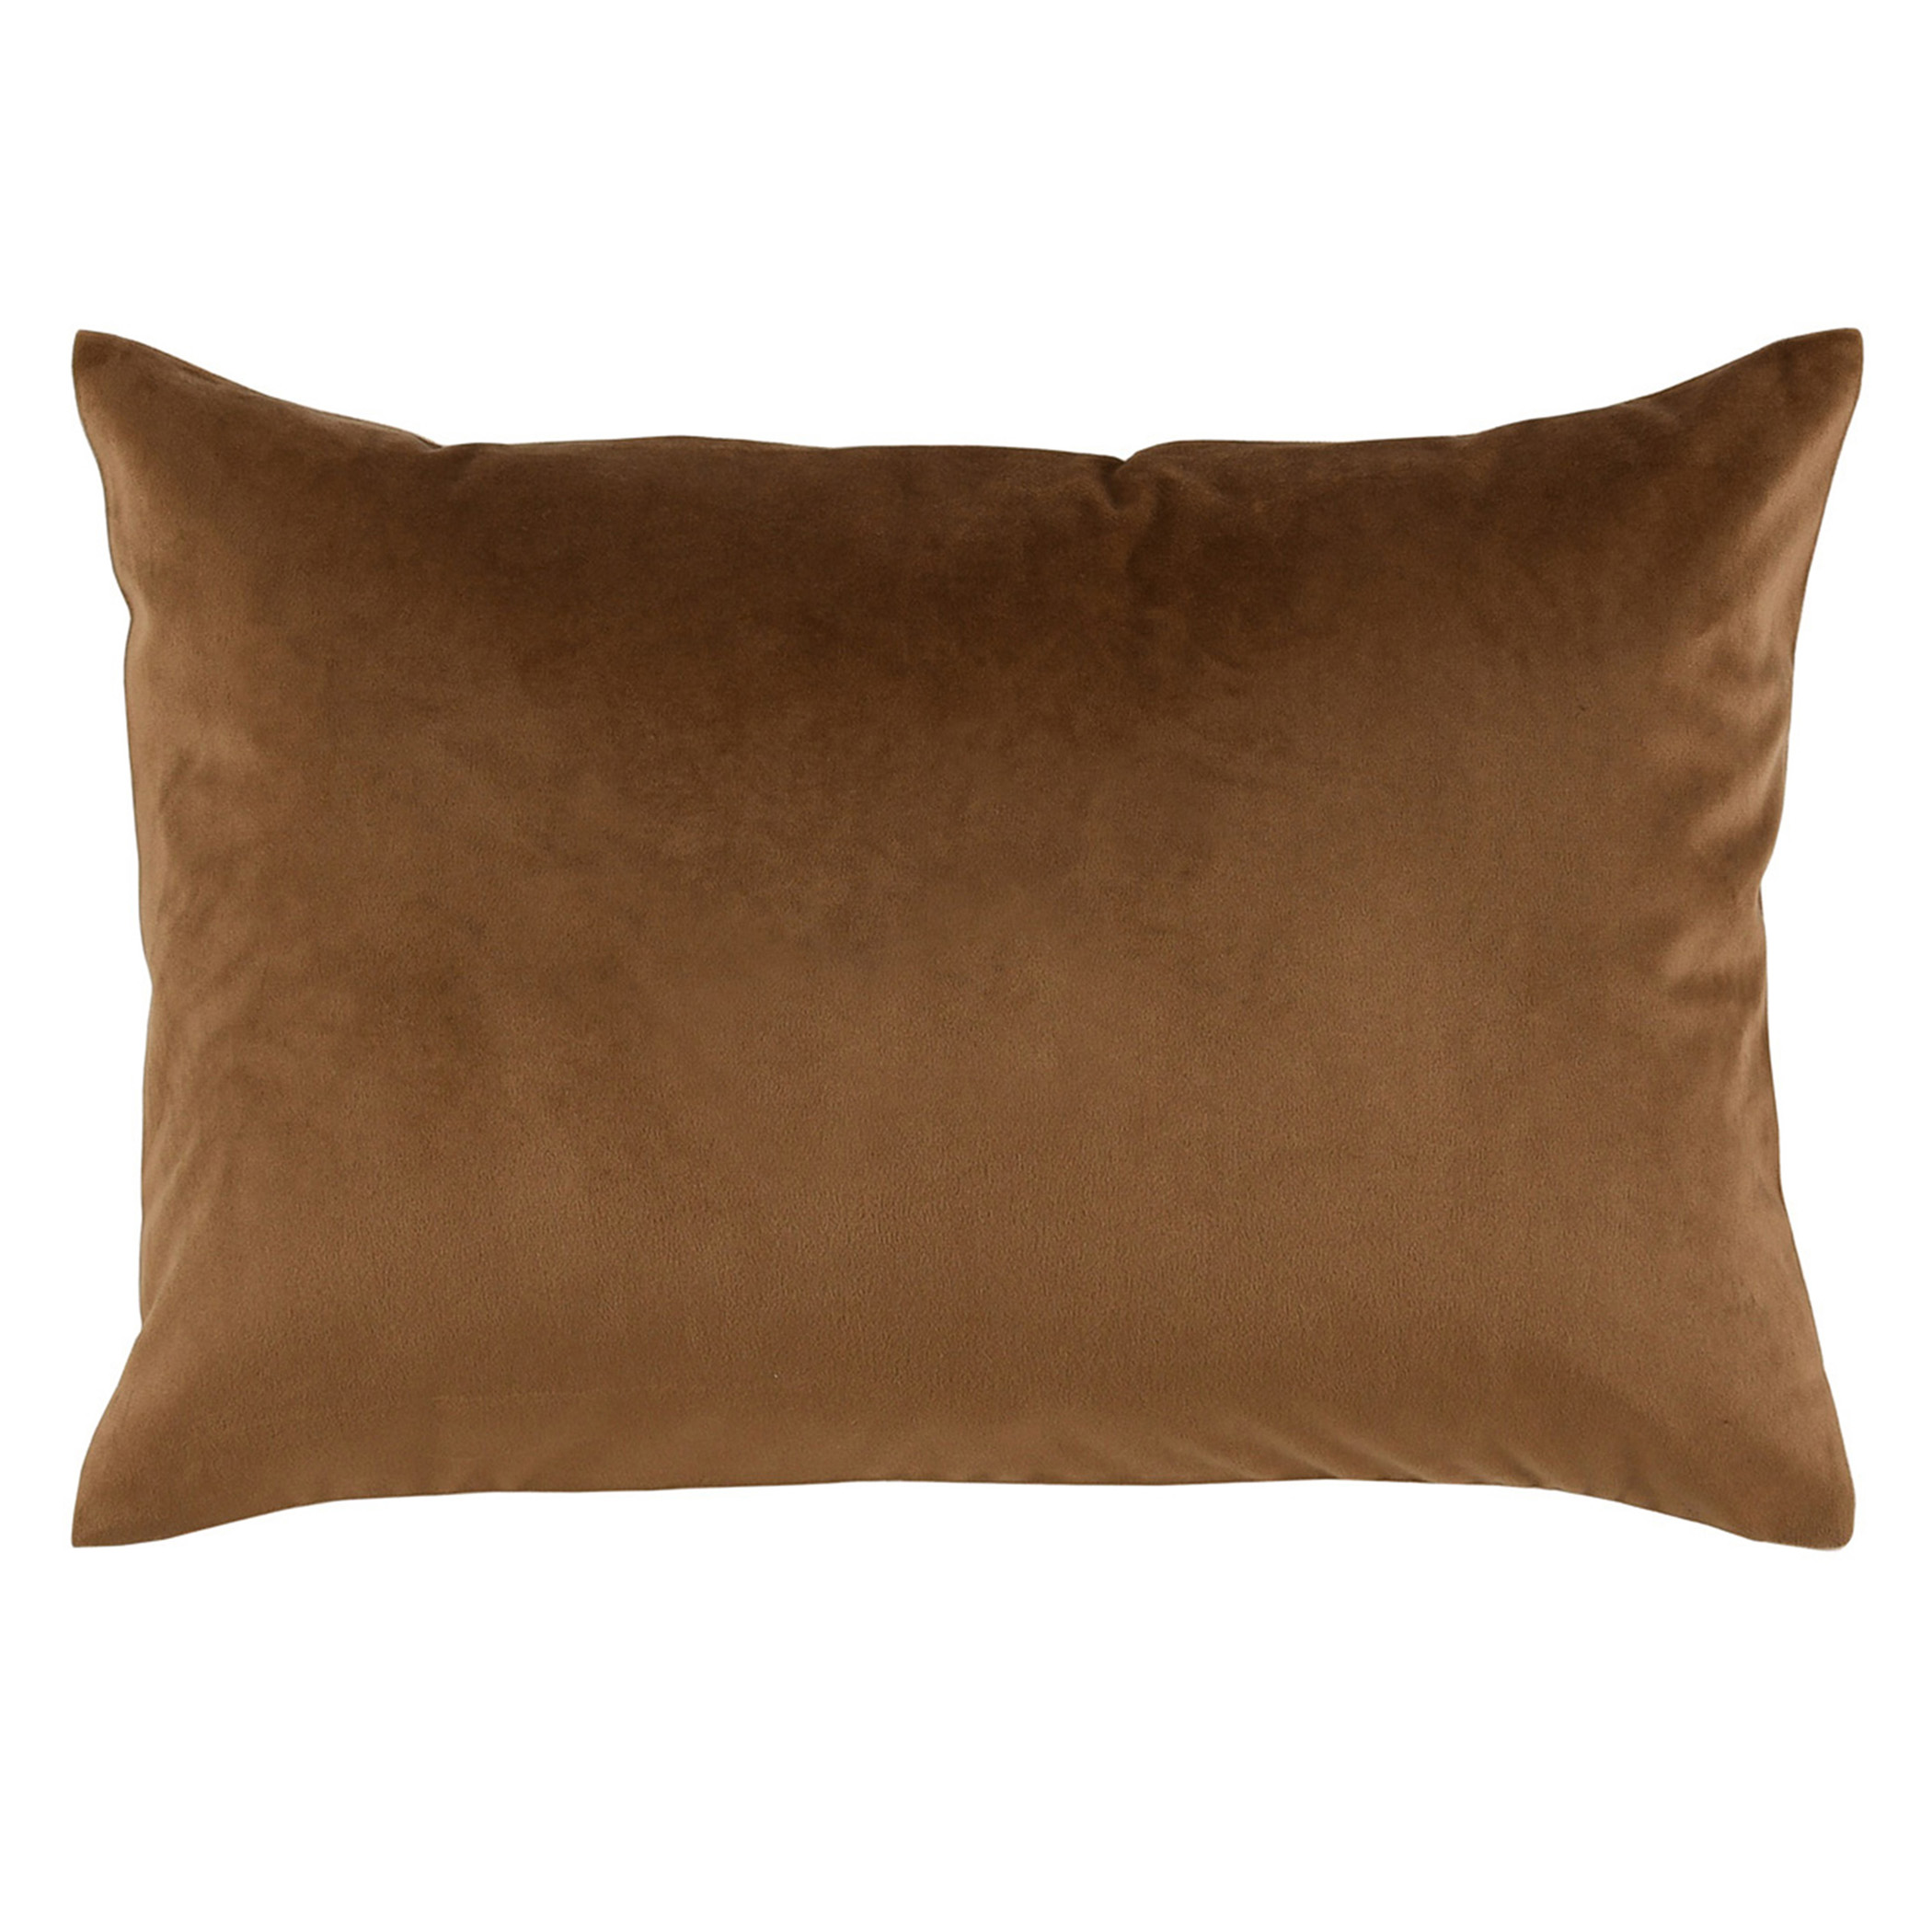 Caelynn Pillow Collection